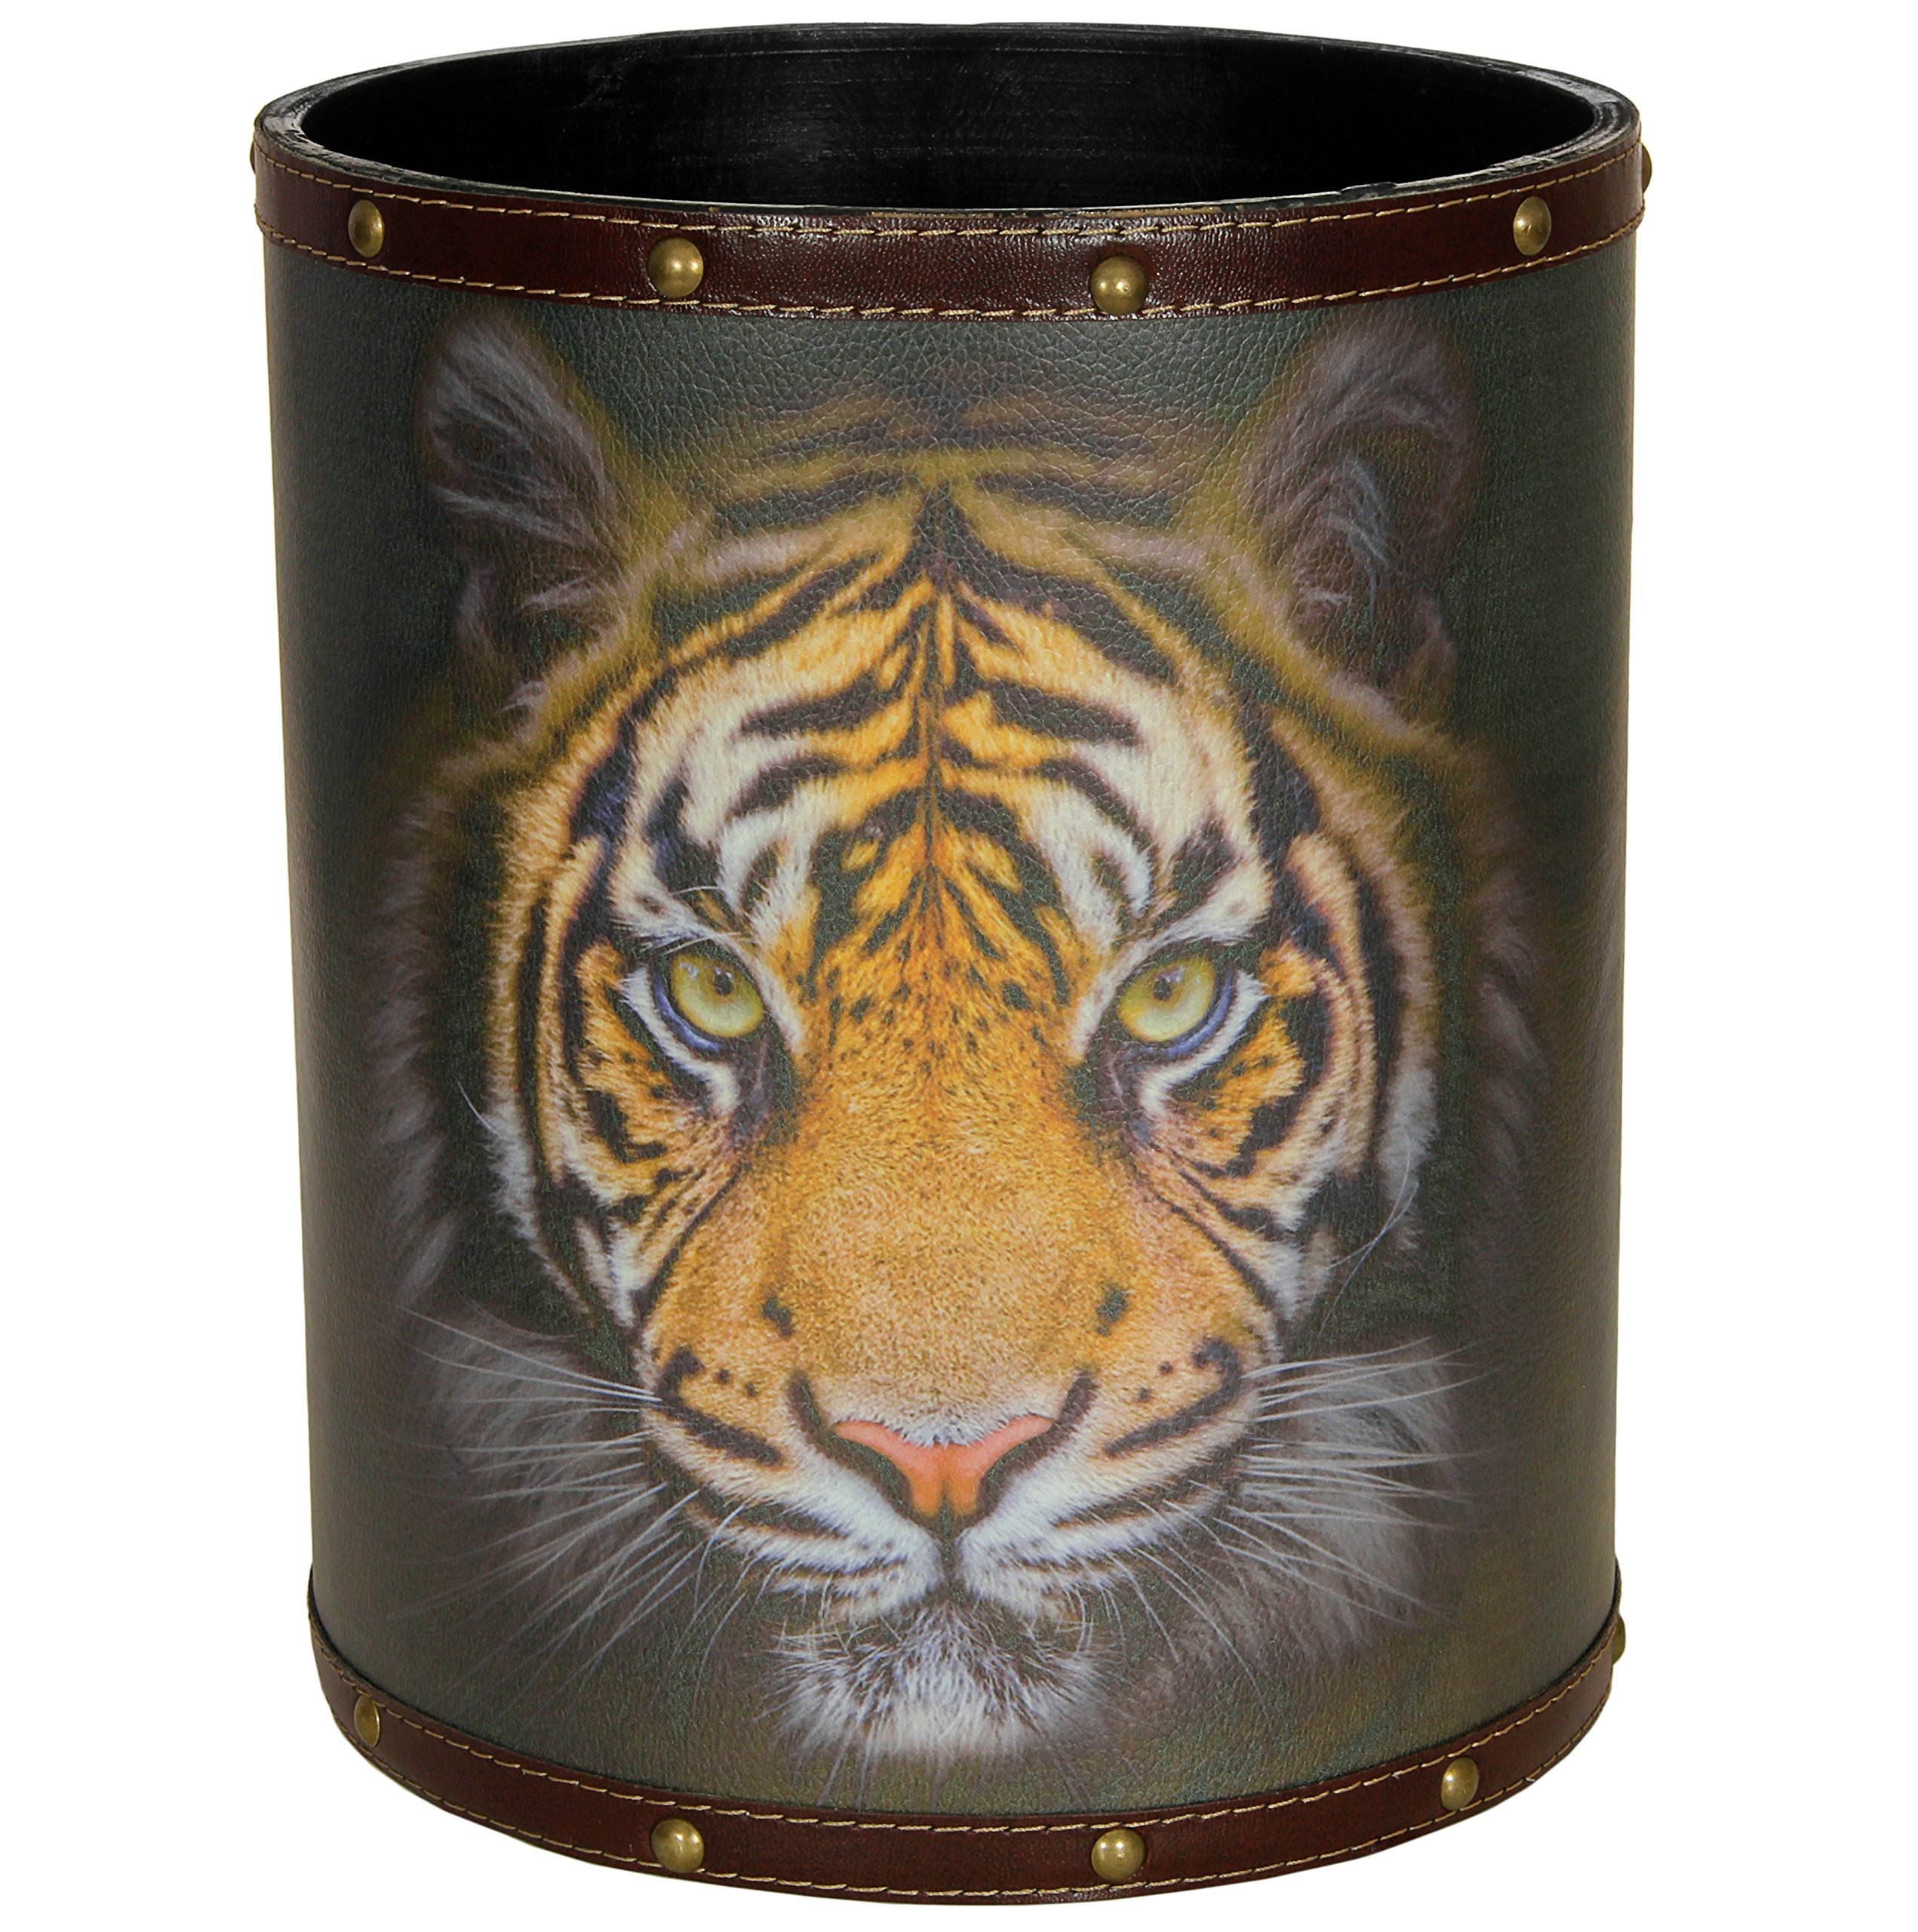 ORIENTAL FURNITURE CAN-WST-TIGER Bengal Tiger Waste Basket